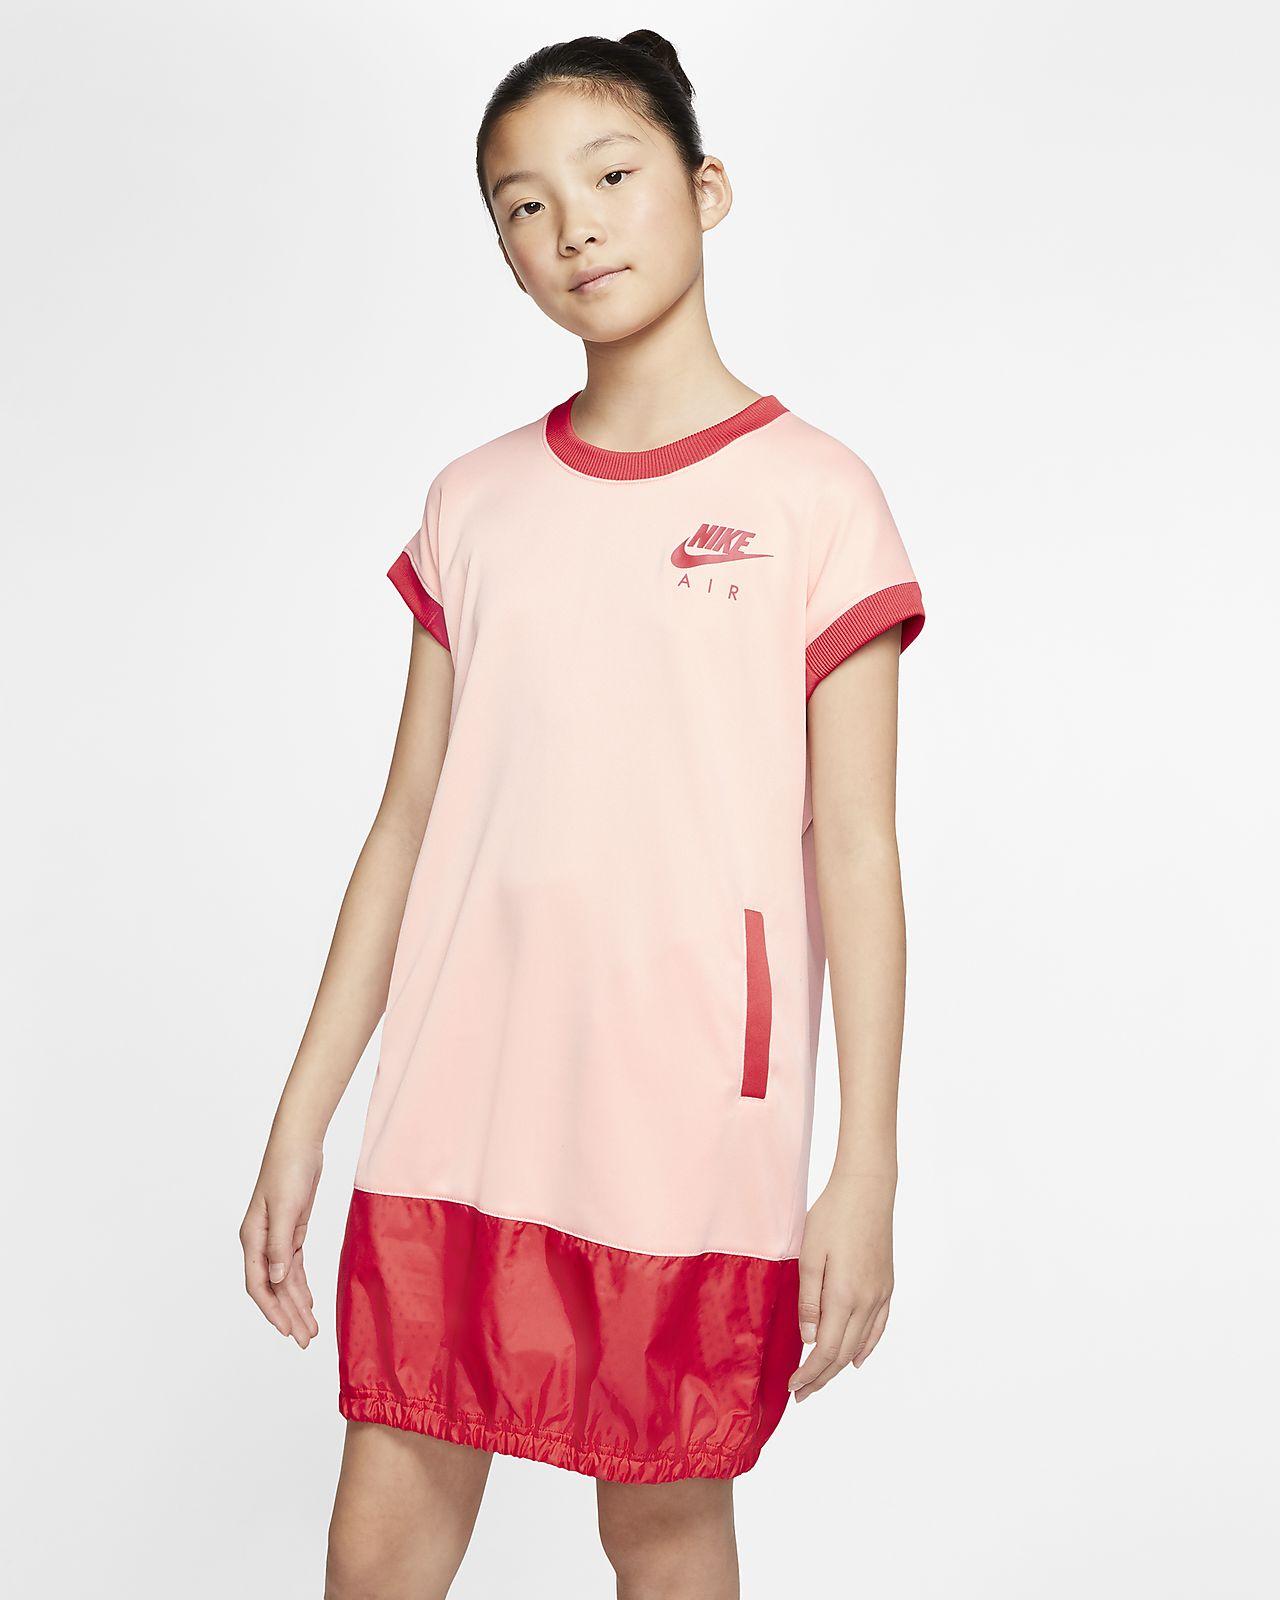 Nike Air Big Kids' (Girls') Short-Sleeve Dress